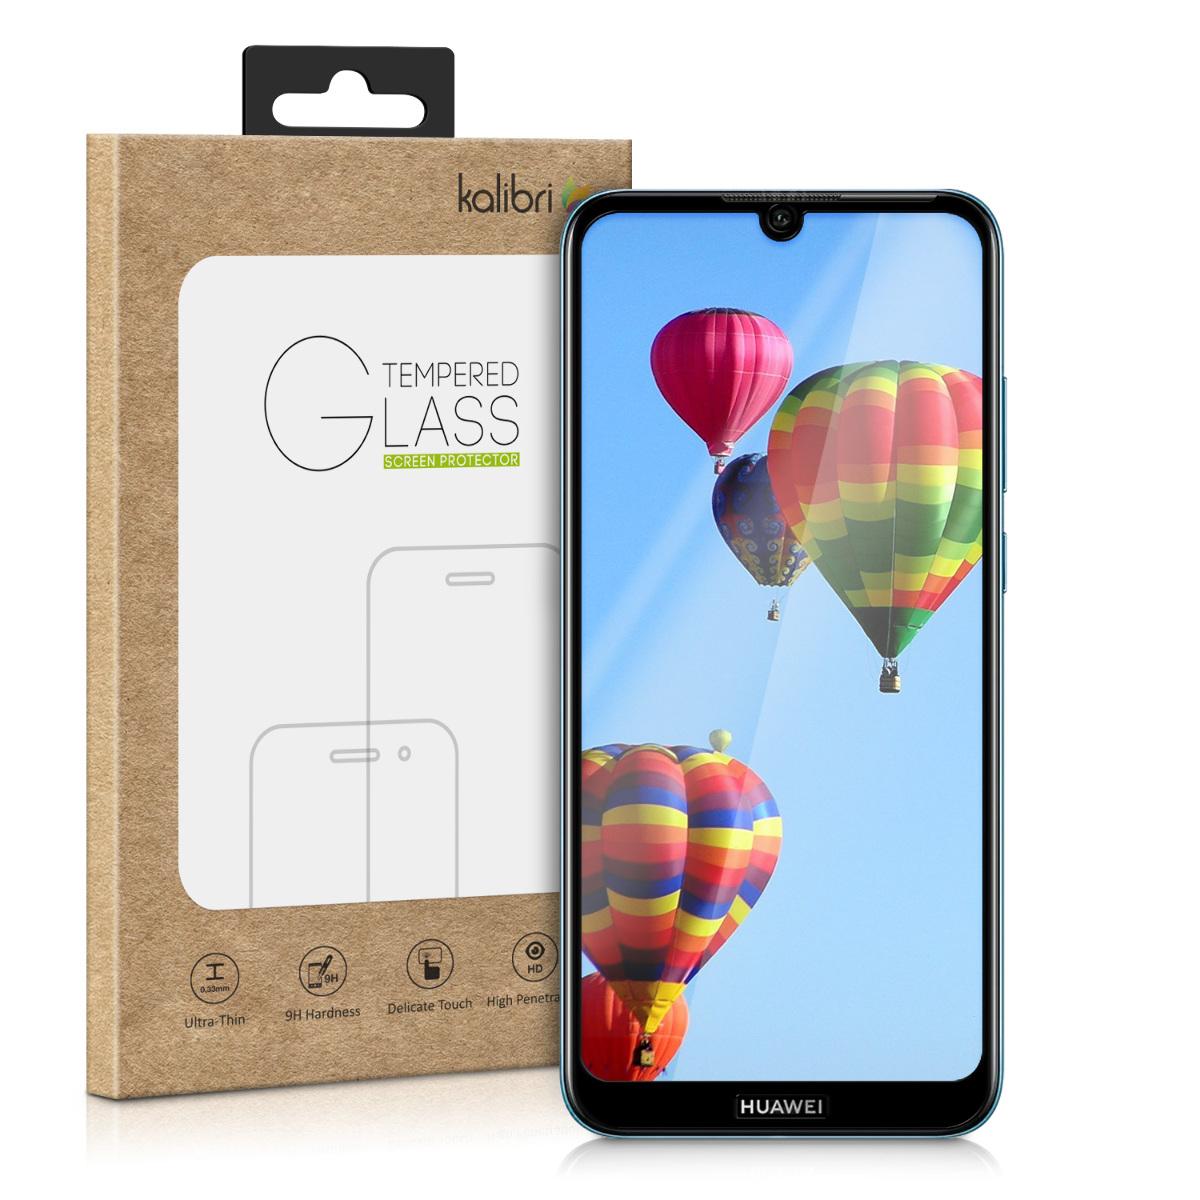 Kalibri Tempered Glass - Fullface Αντιχαρακτικό Γυαλί Οθόνης Huawei Y6 2019 - Black (48806.01)